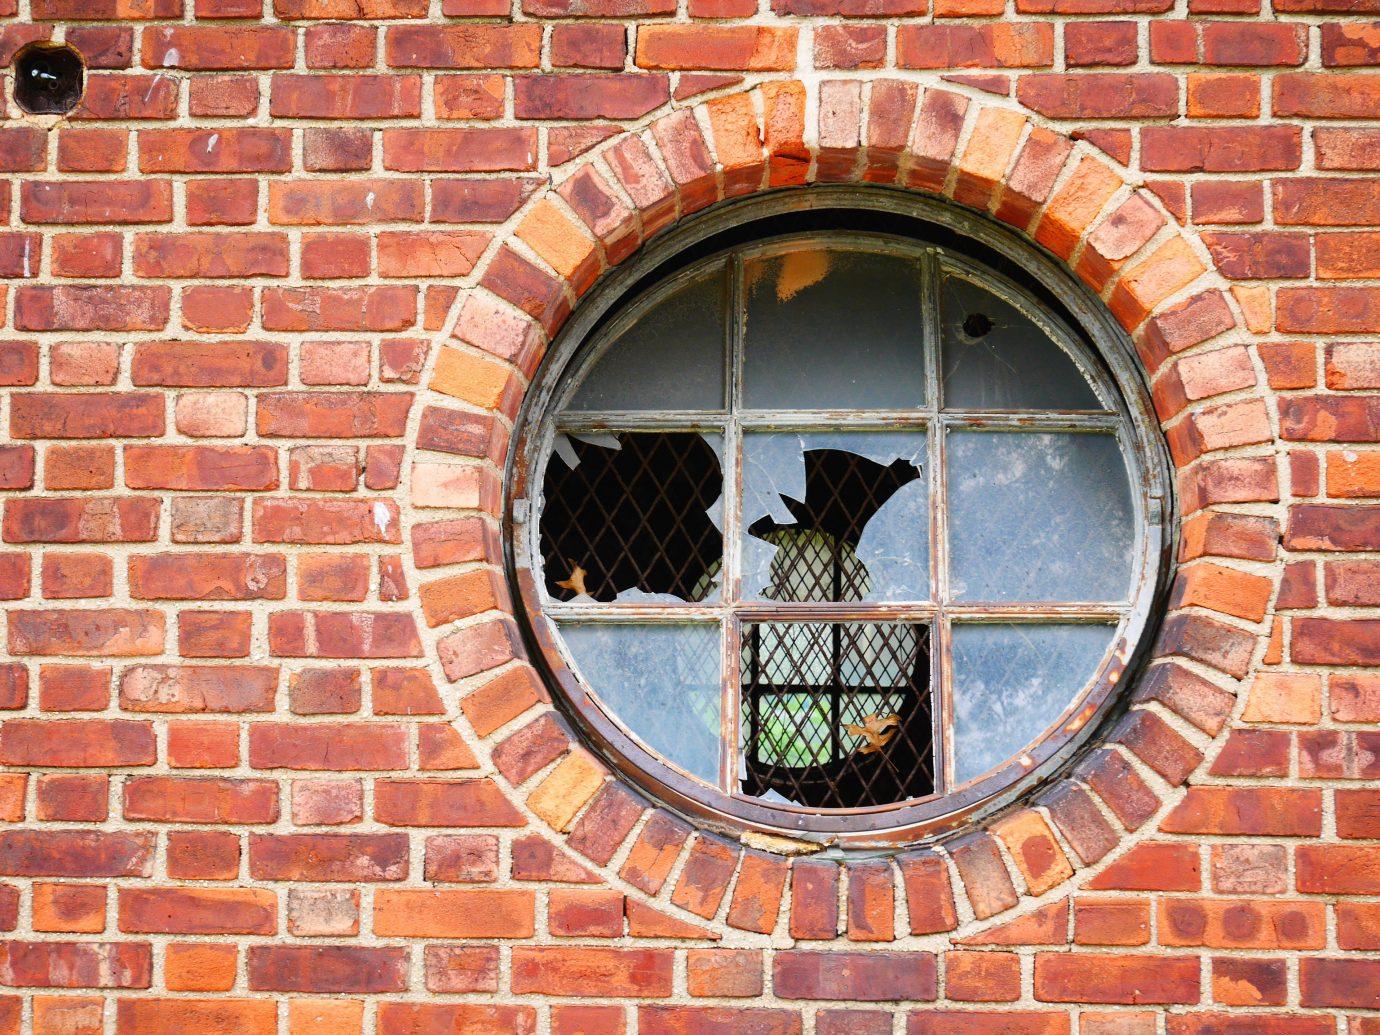 Offbeat outdoor brickwork brick building wall road surface window art facade material arch building material